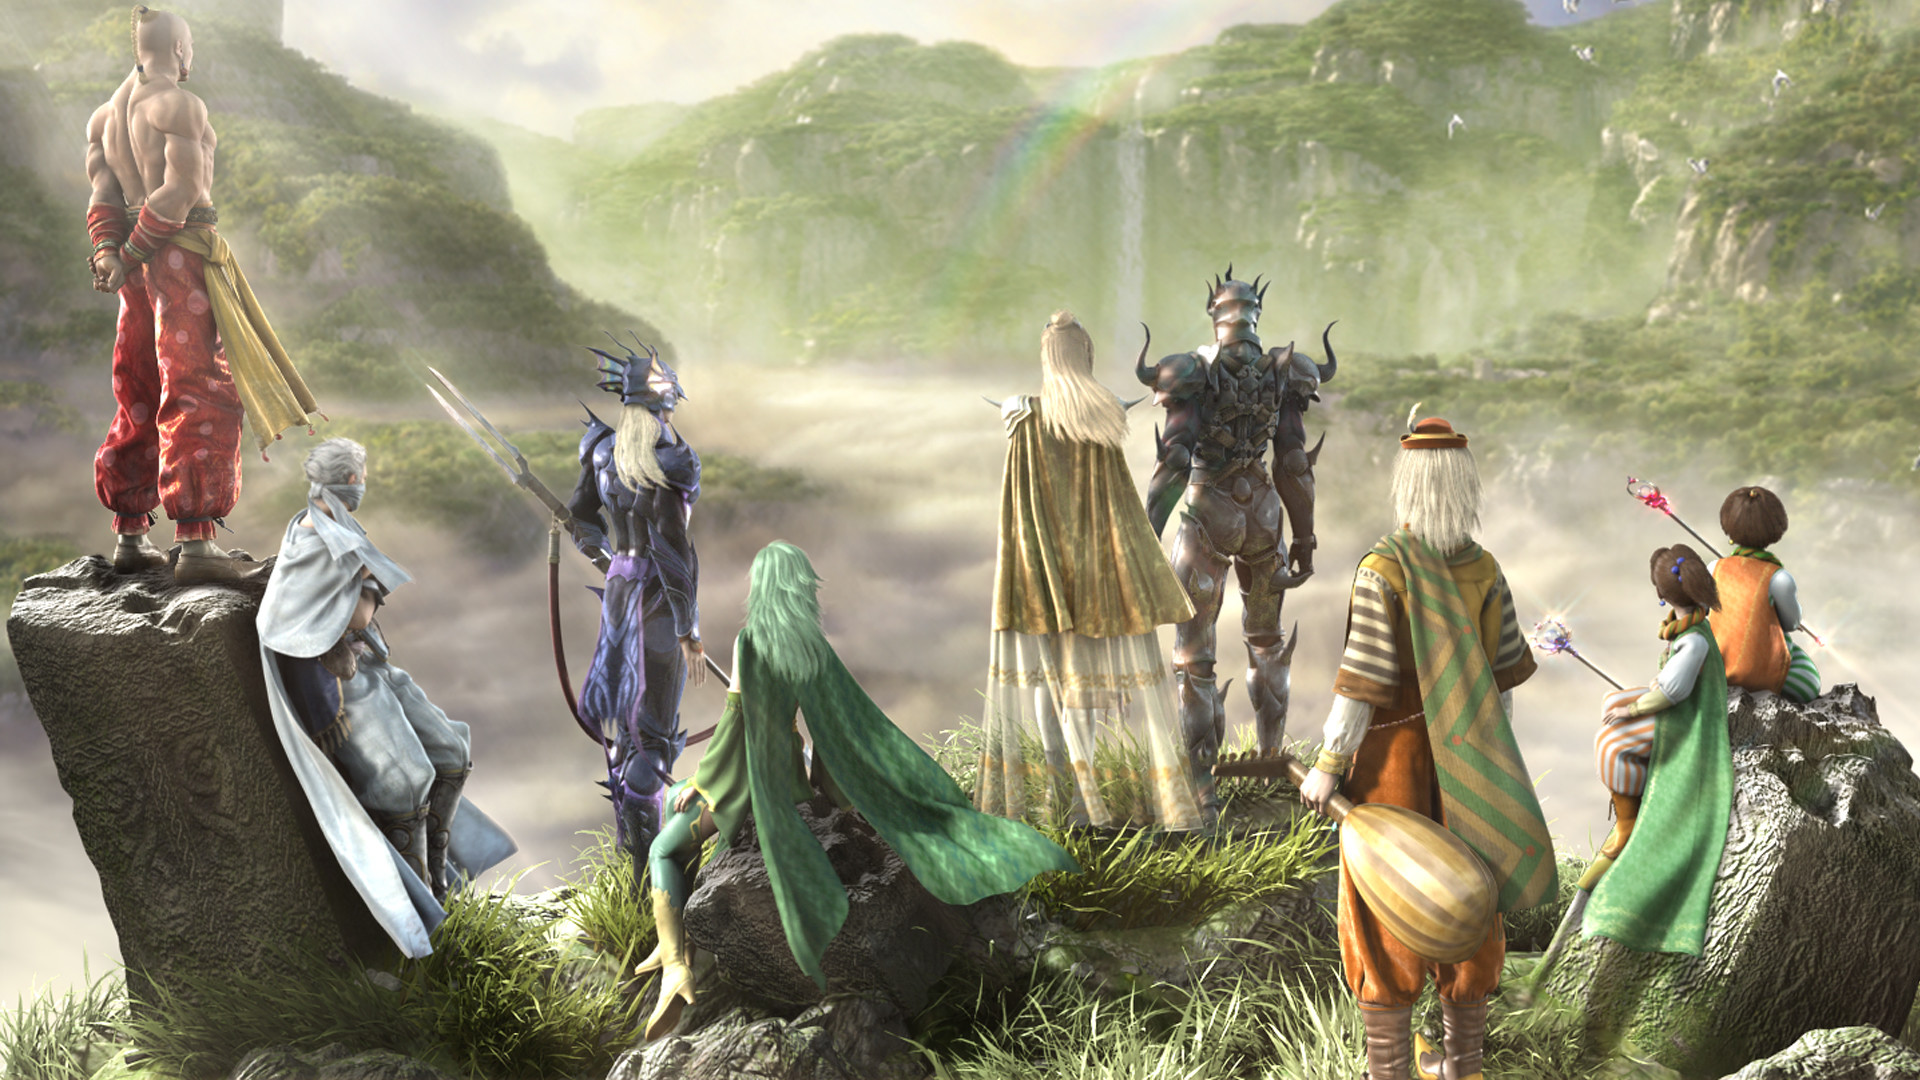 Final Fantasy IV Wallpaper 009 – The Gathering